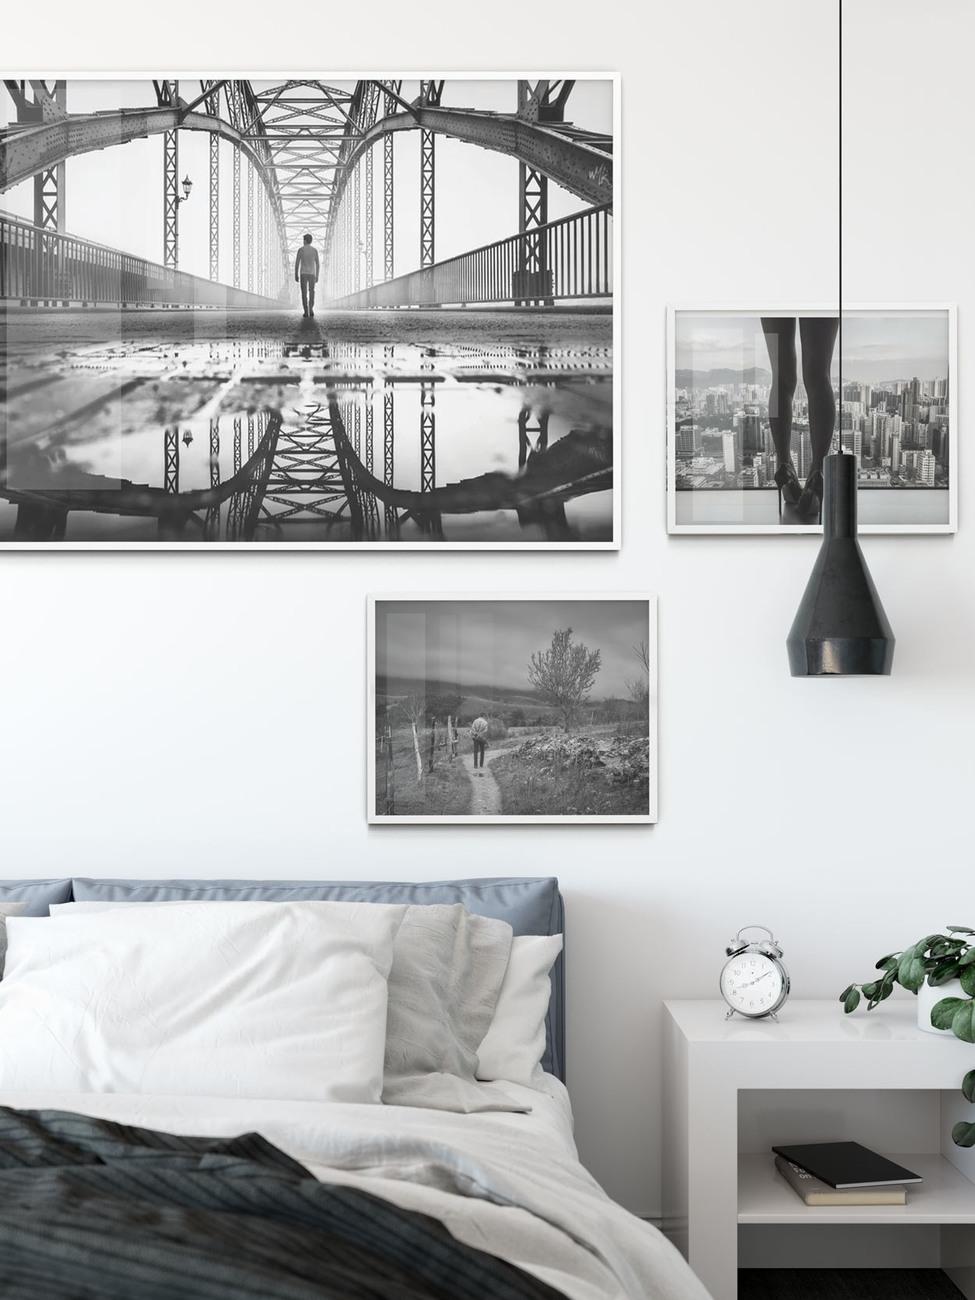 Umělecká fotografie  The Bridge